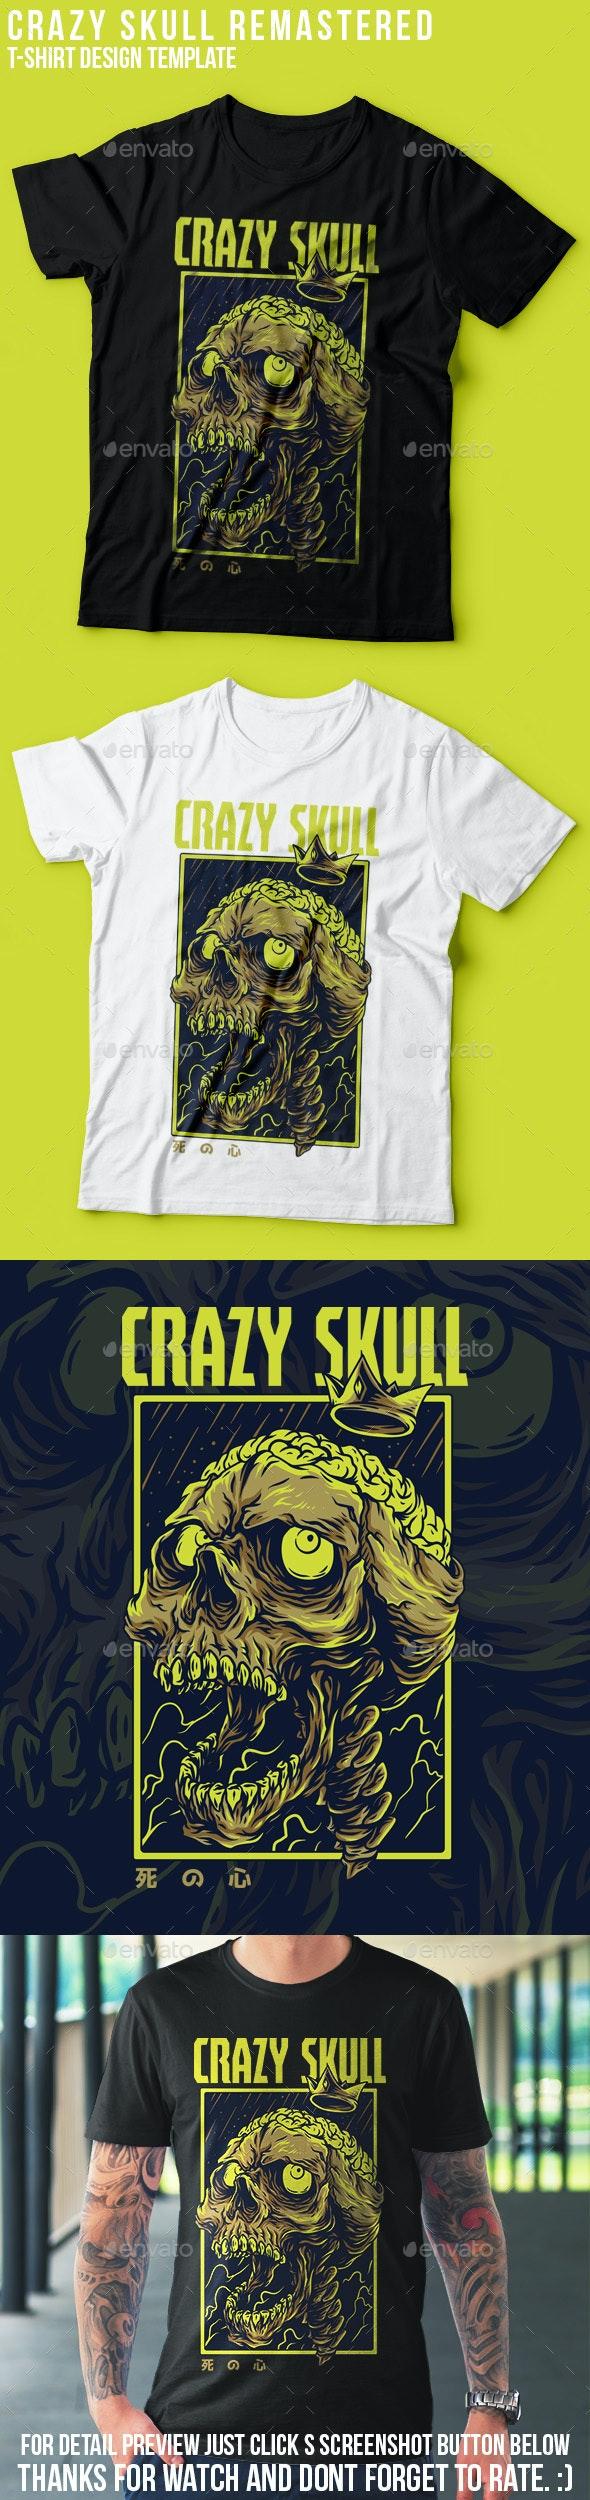 Crazy Skull Remastered T-Shirt Design - Funny Designs